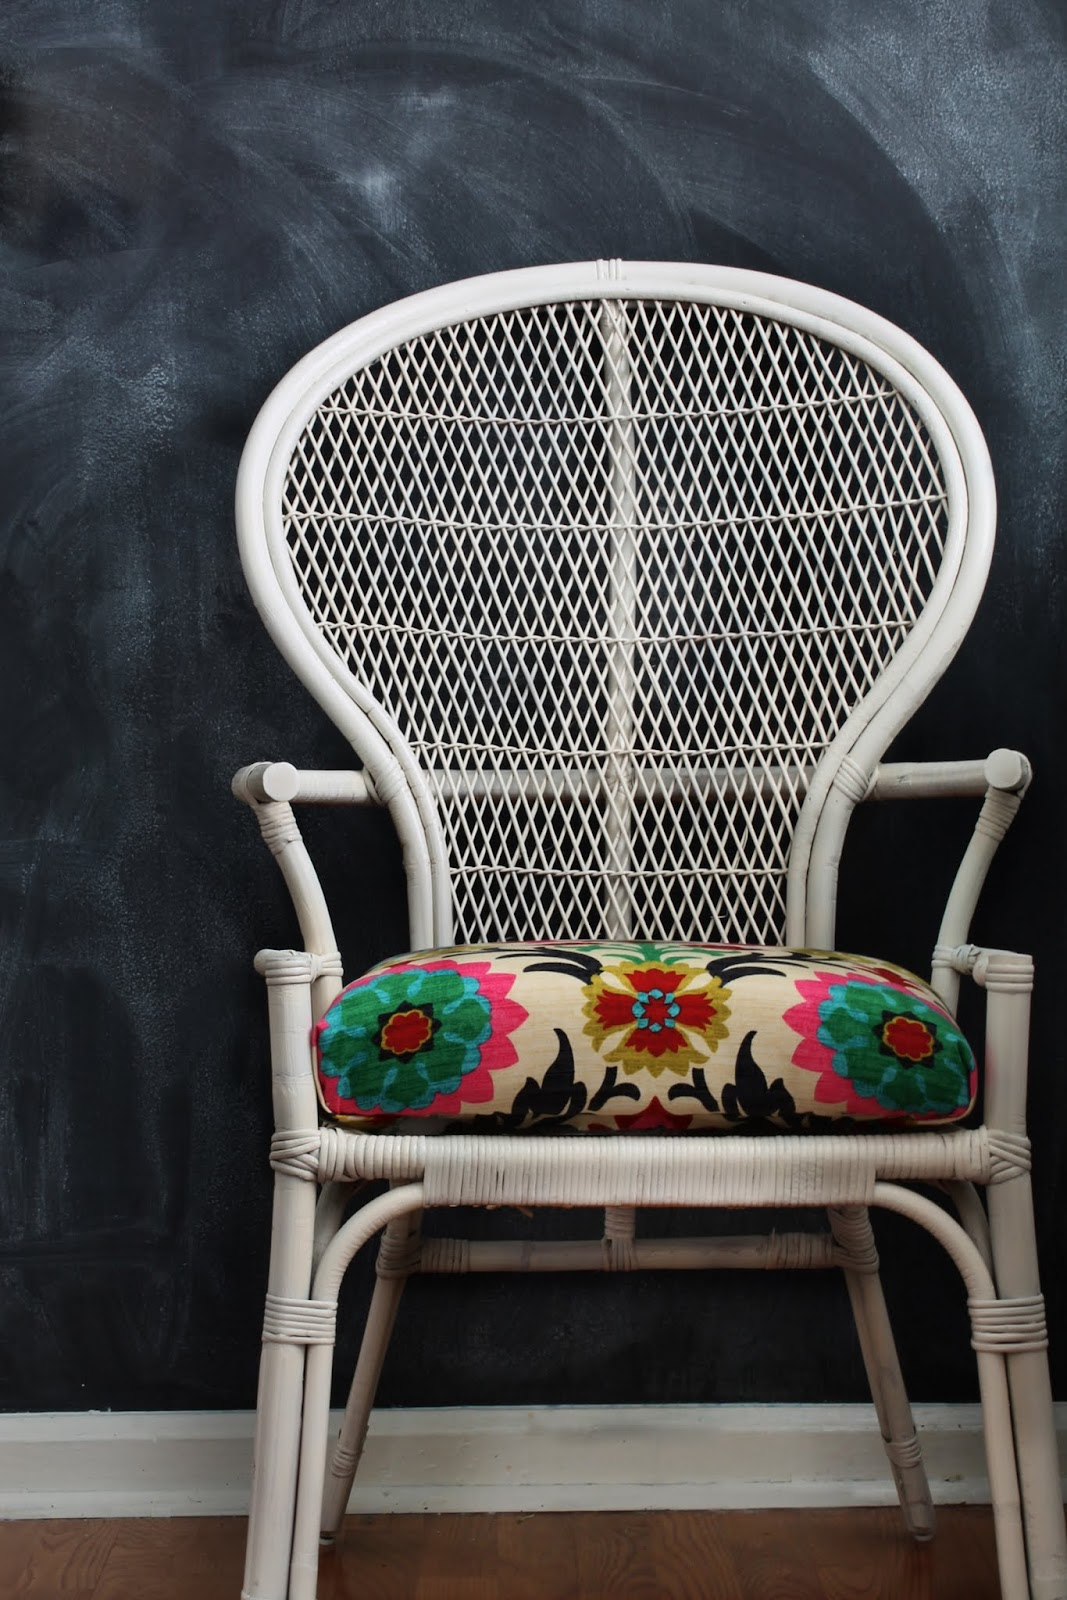 ... Craigslist Santa Maria Furniture By Hunted Interior My Little Blogging  Corner ...